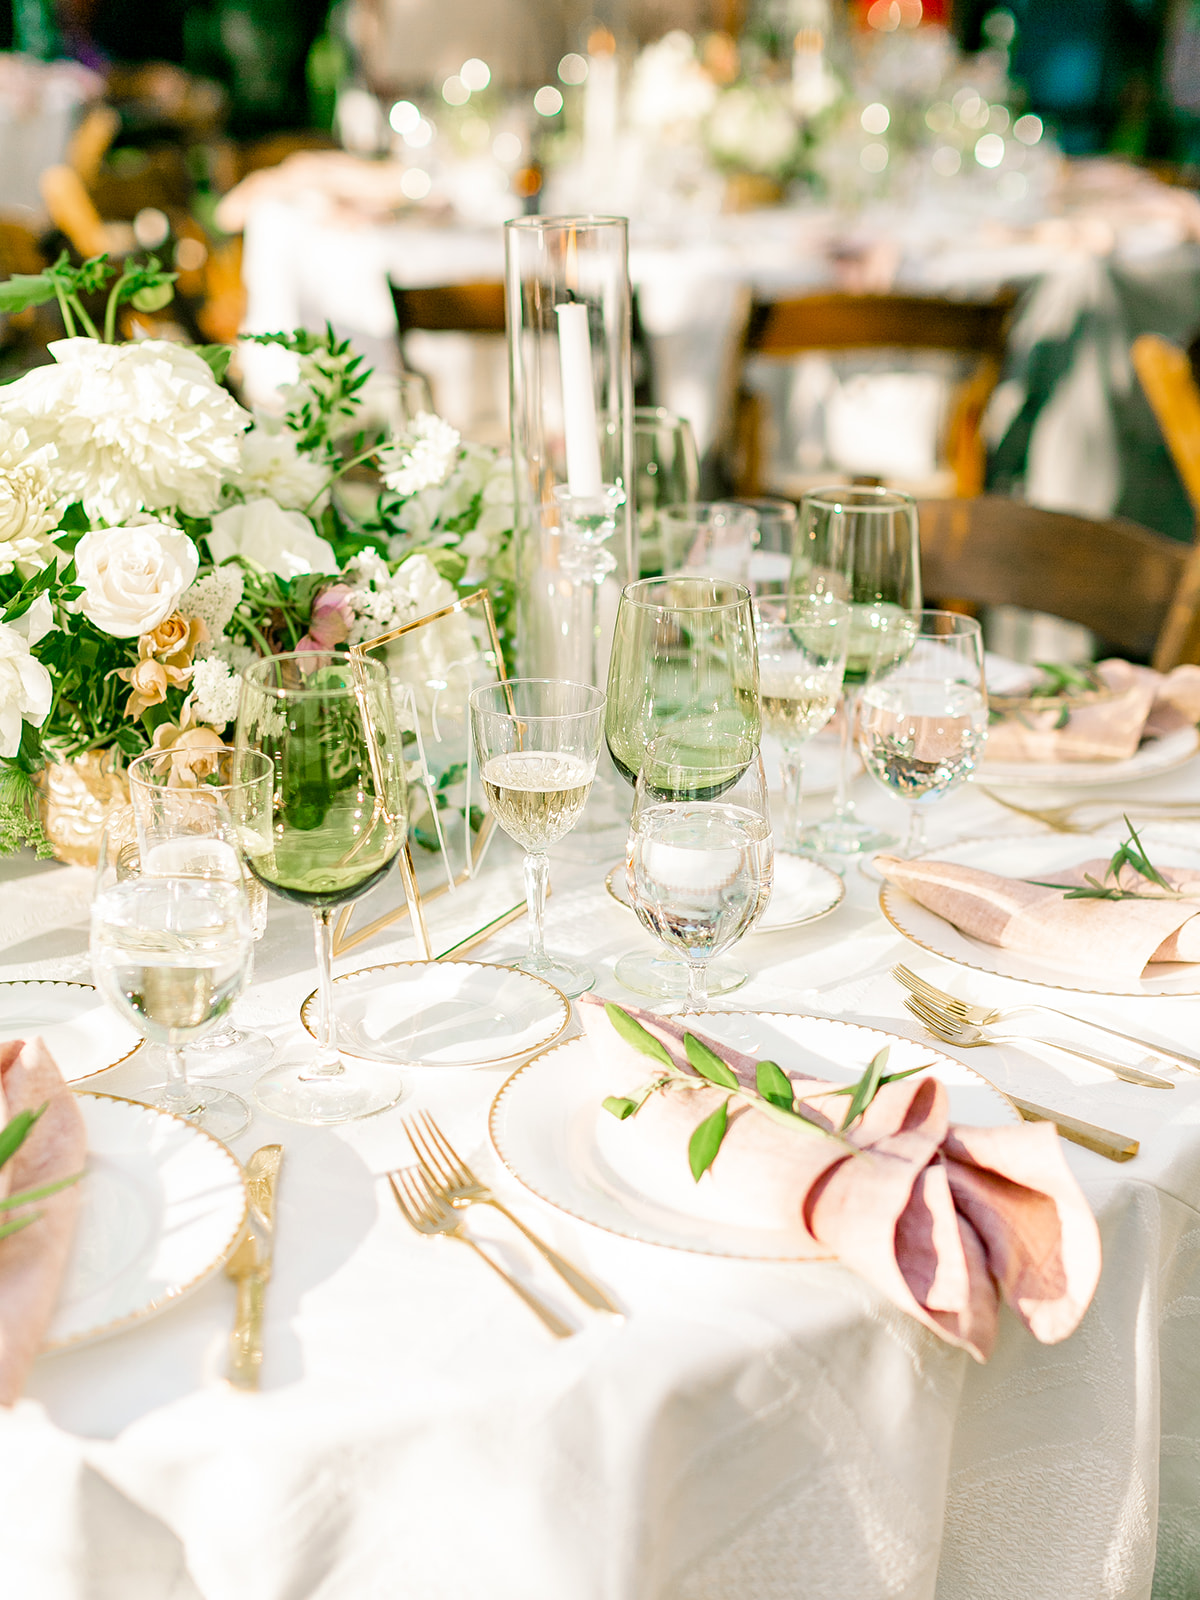 Luxury Wedding Tablescape - Natalie Schutt Photography.jpg